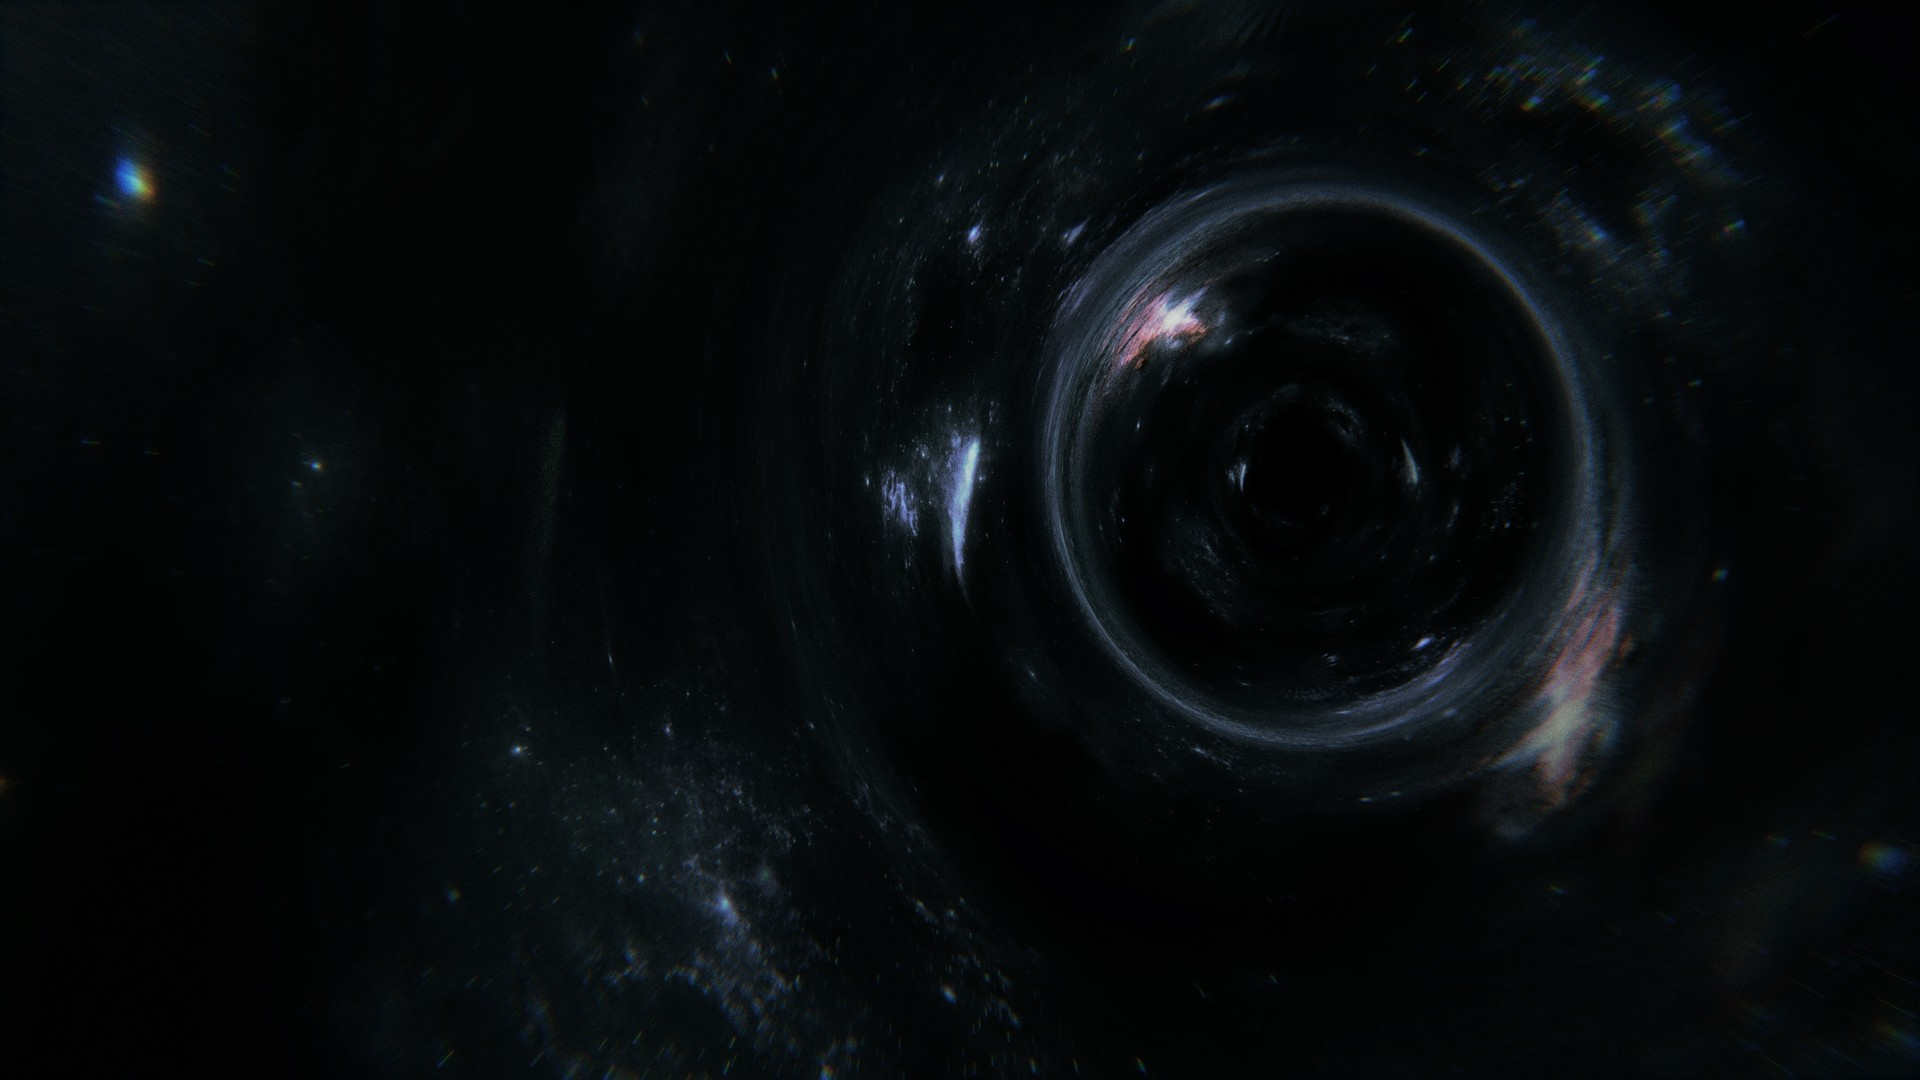 Смотреть раздолбанные дыры, Порно Анальная дыра -видео. Смотреть порно 18 фотография